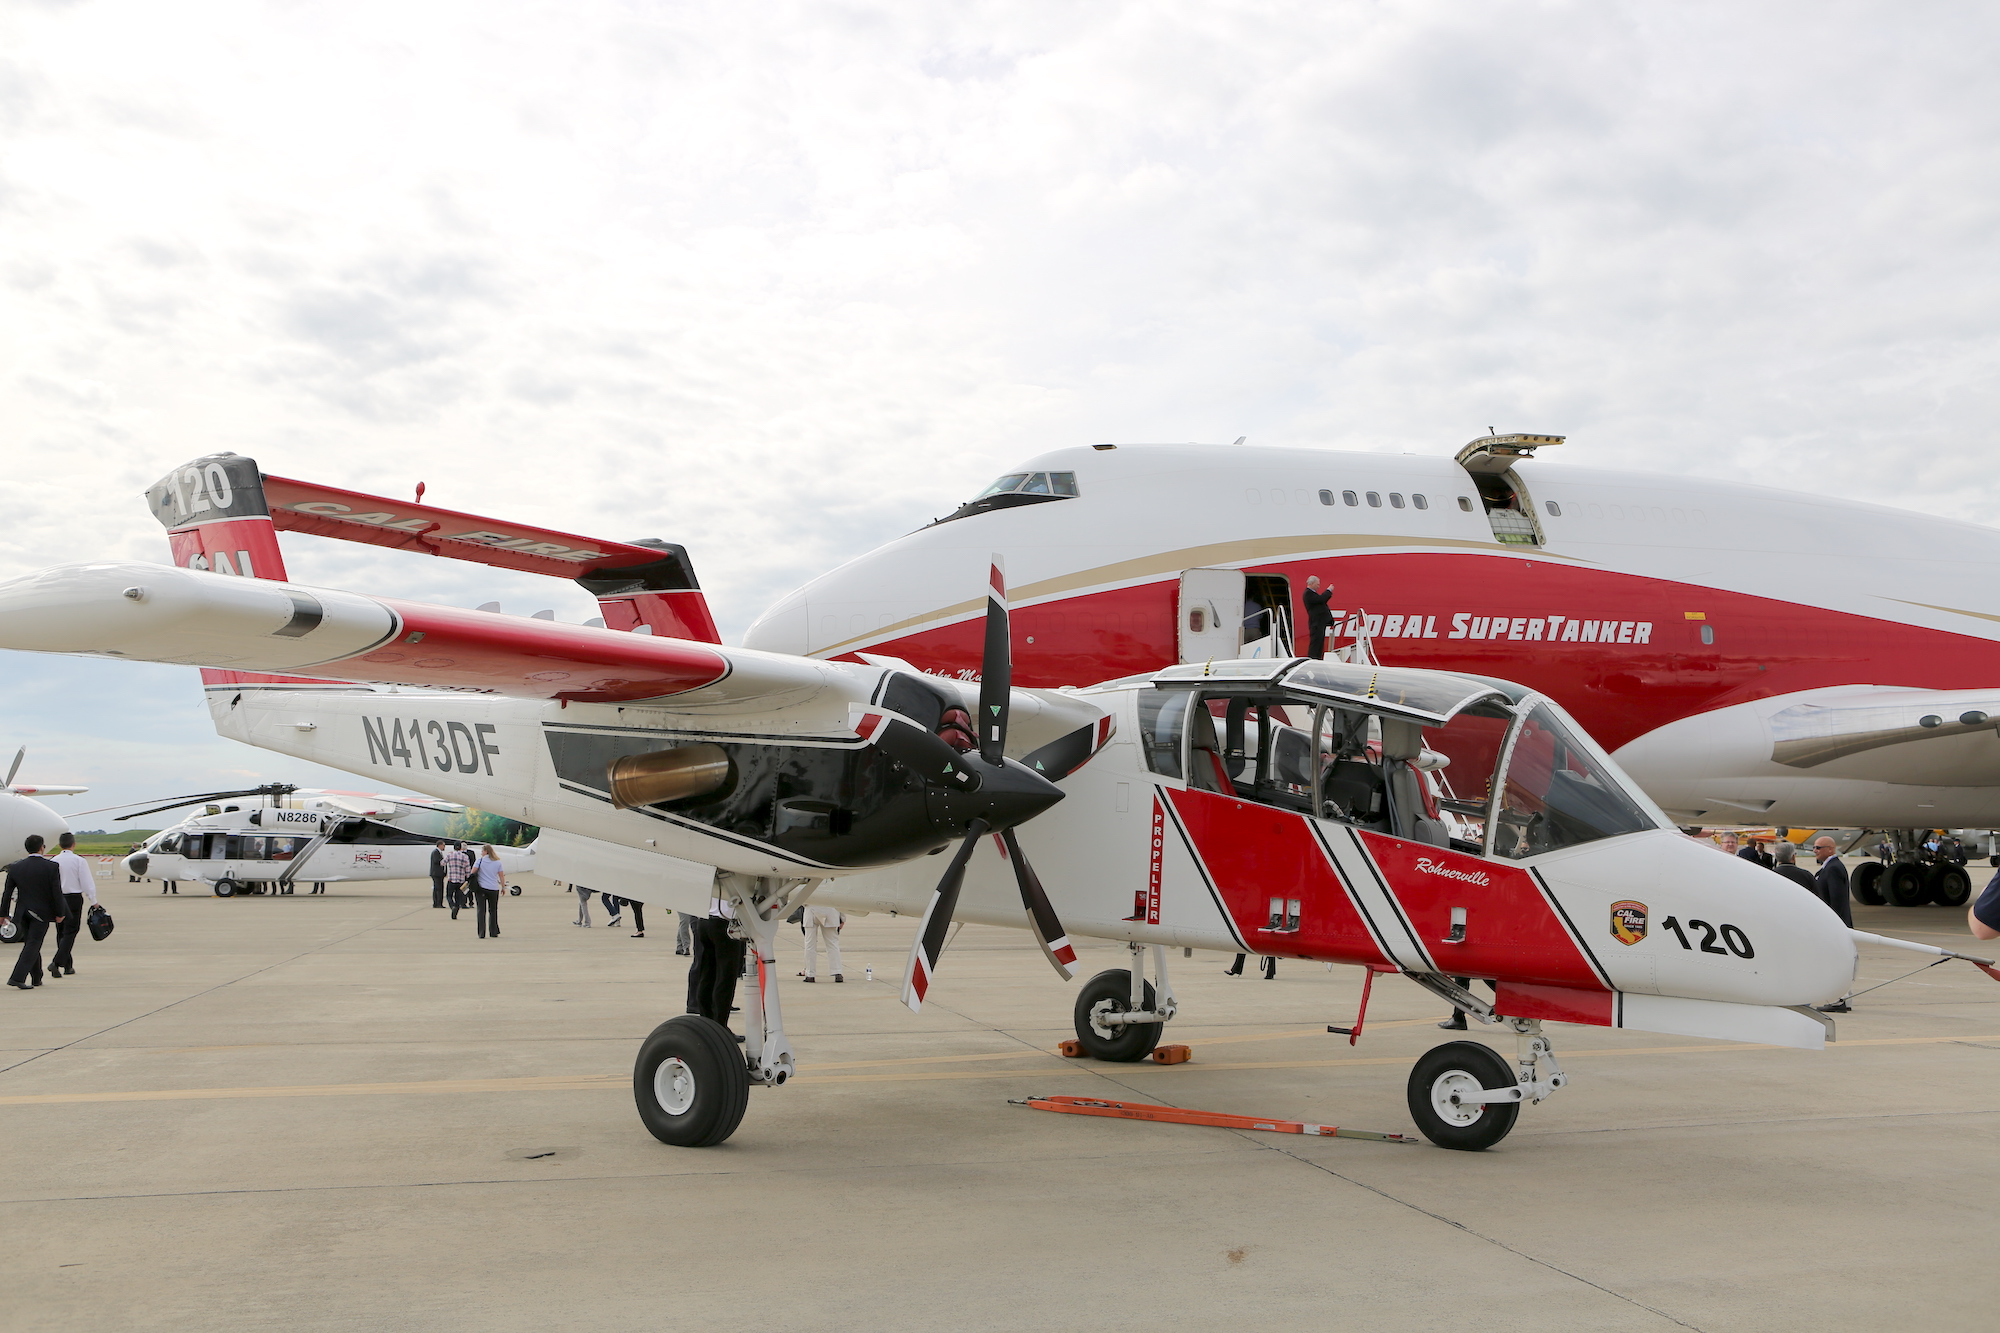 FlyEurope-Aerial Firefighting North America 2020